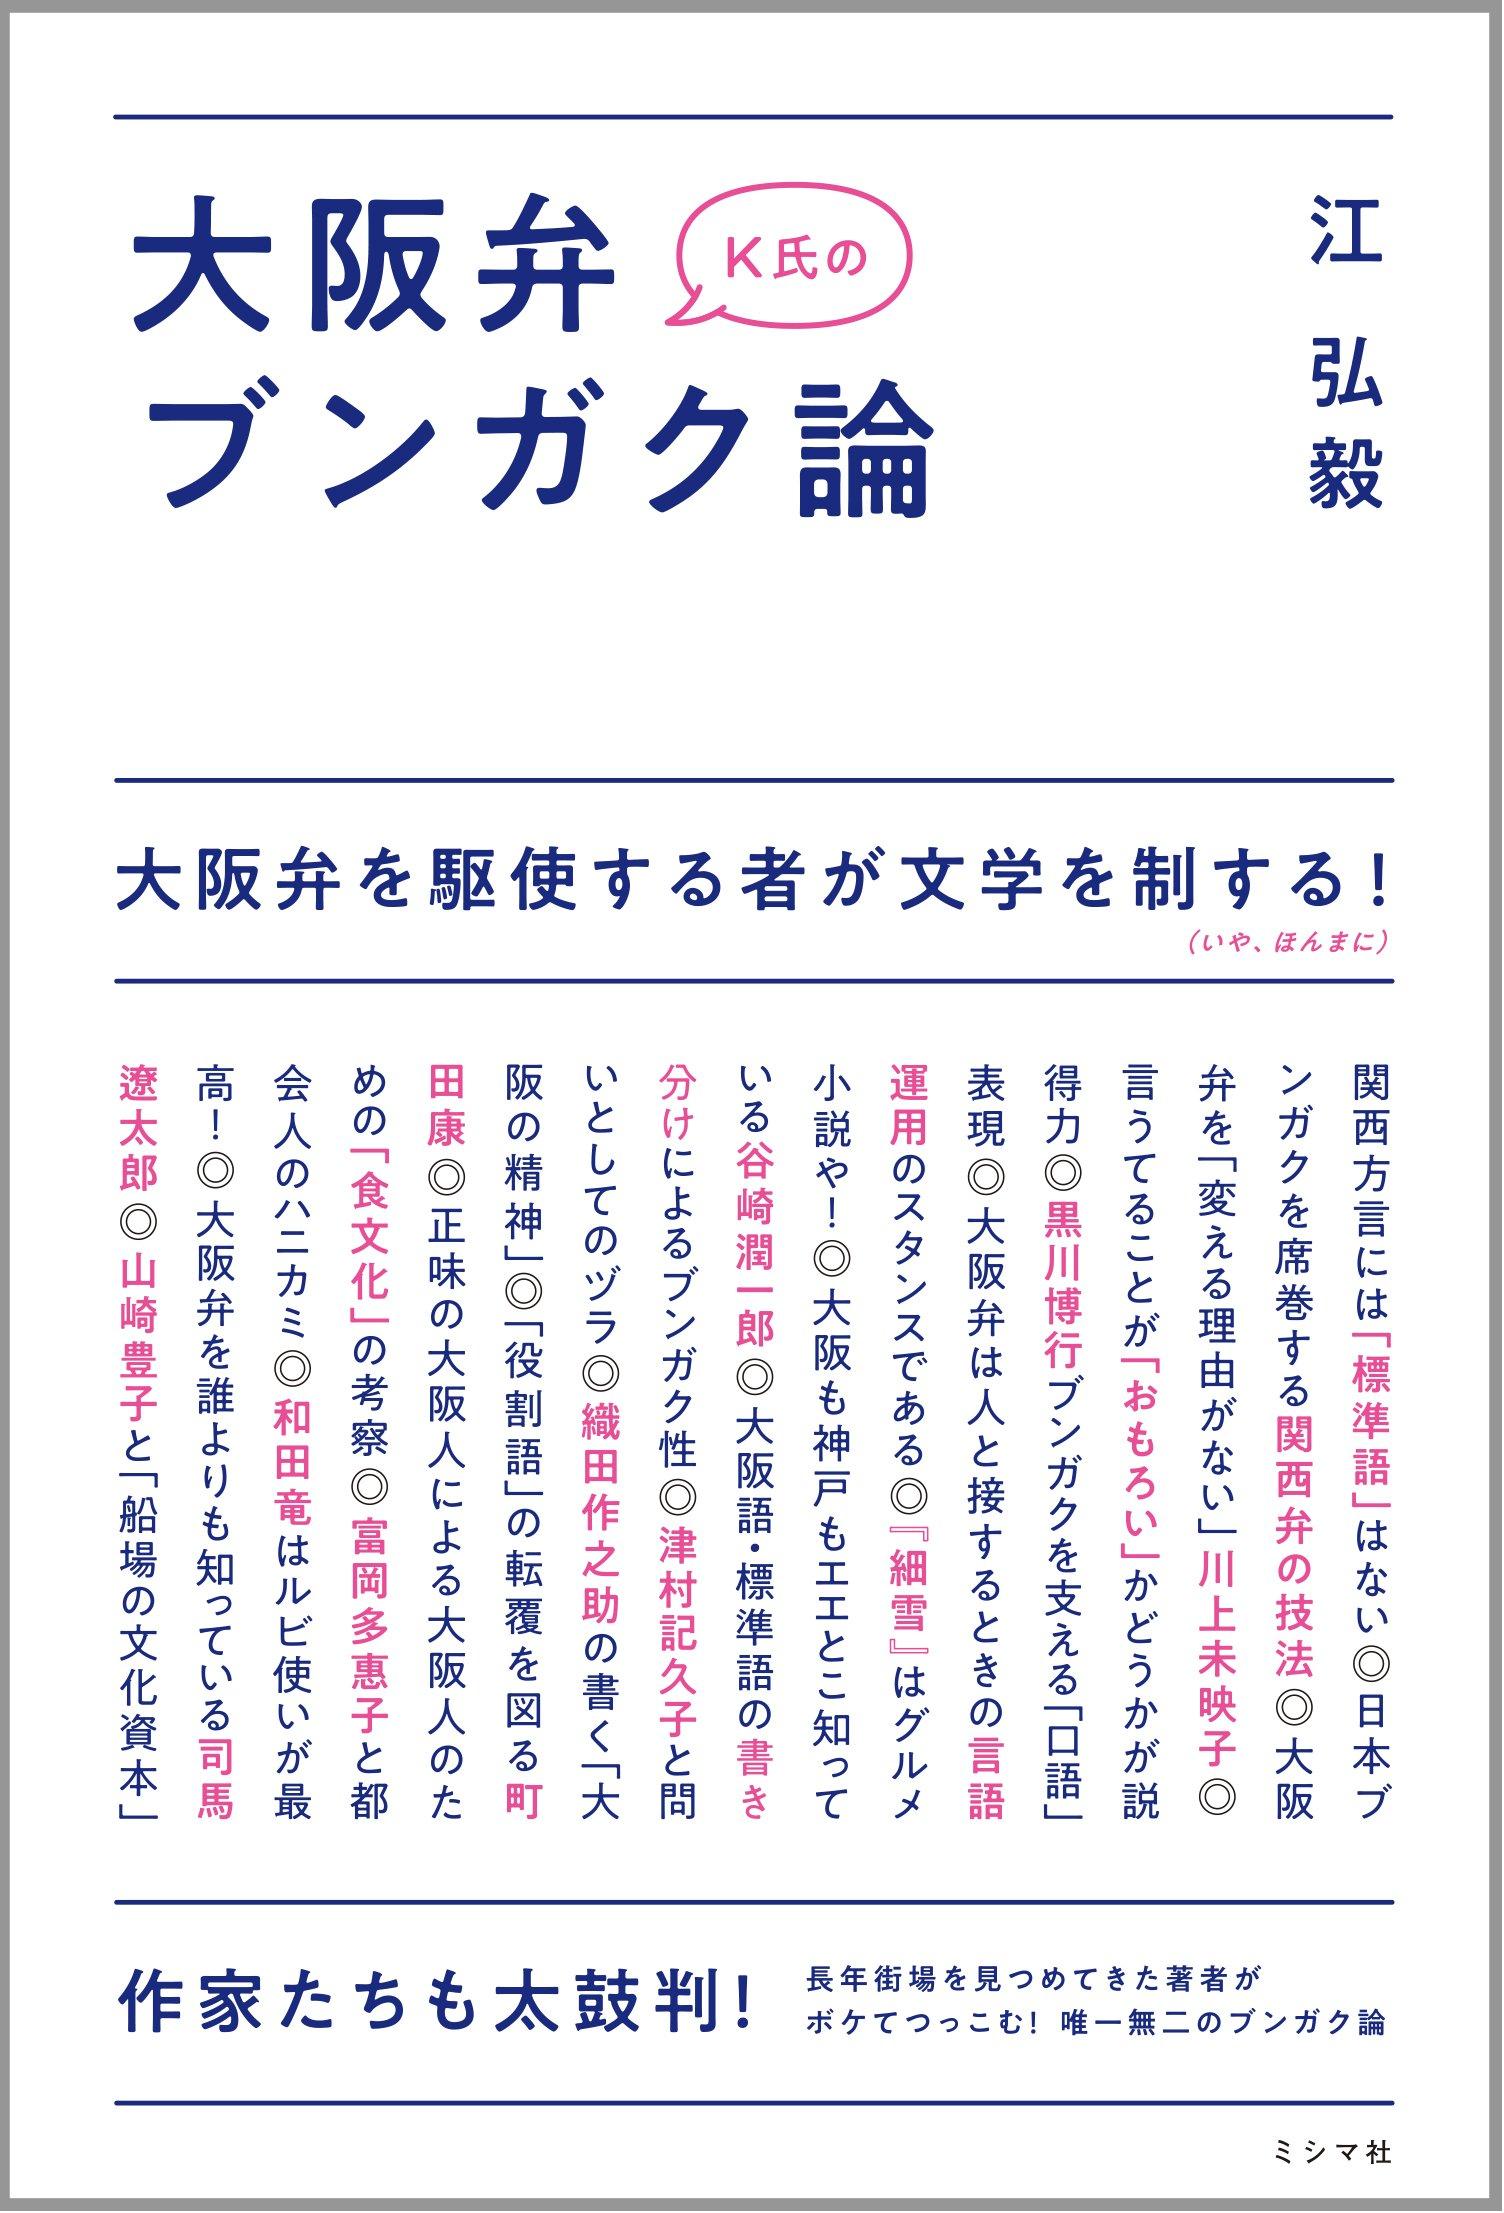 K氏の大阪弁ブンガク論 | 江弘毅 |本 | 通販 | Amazon